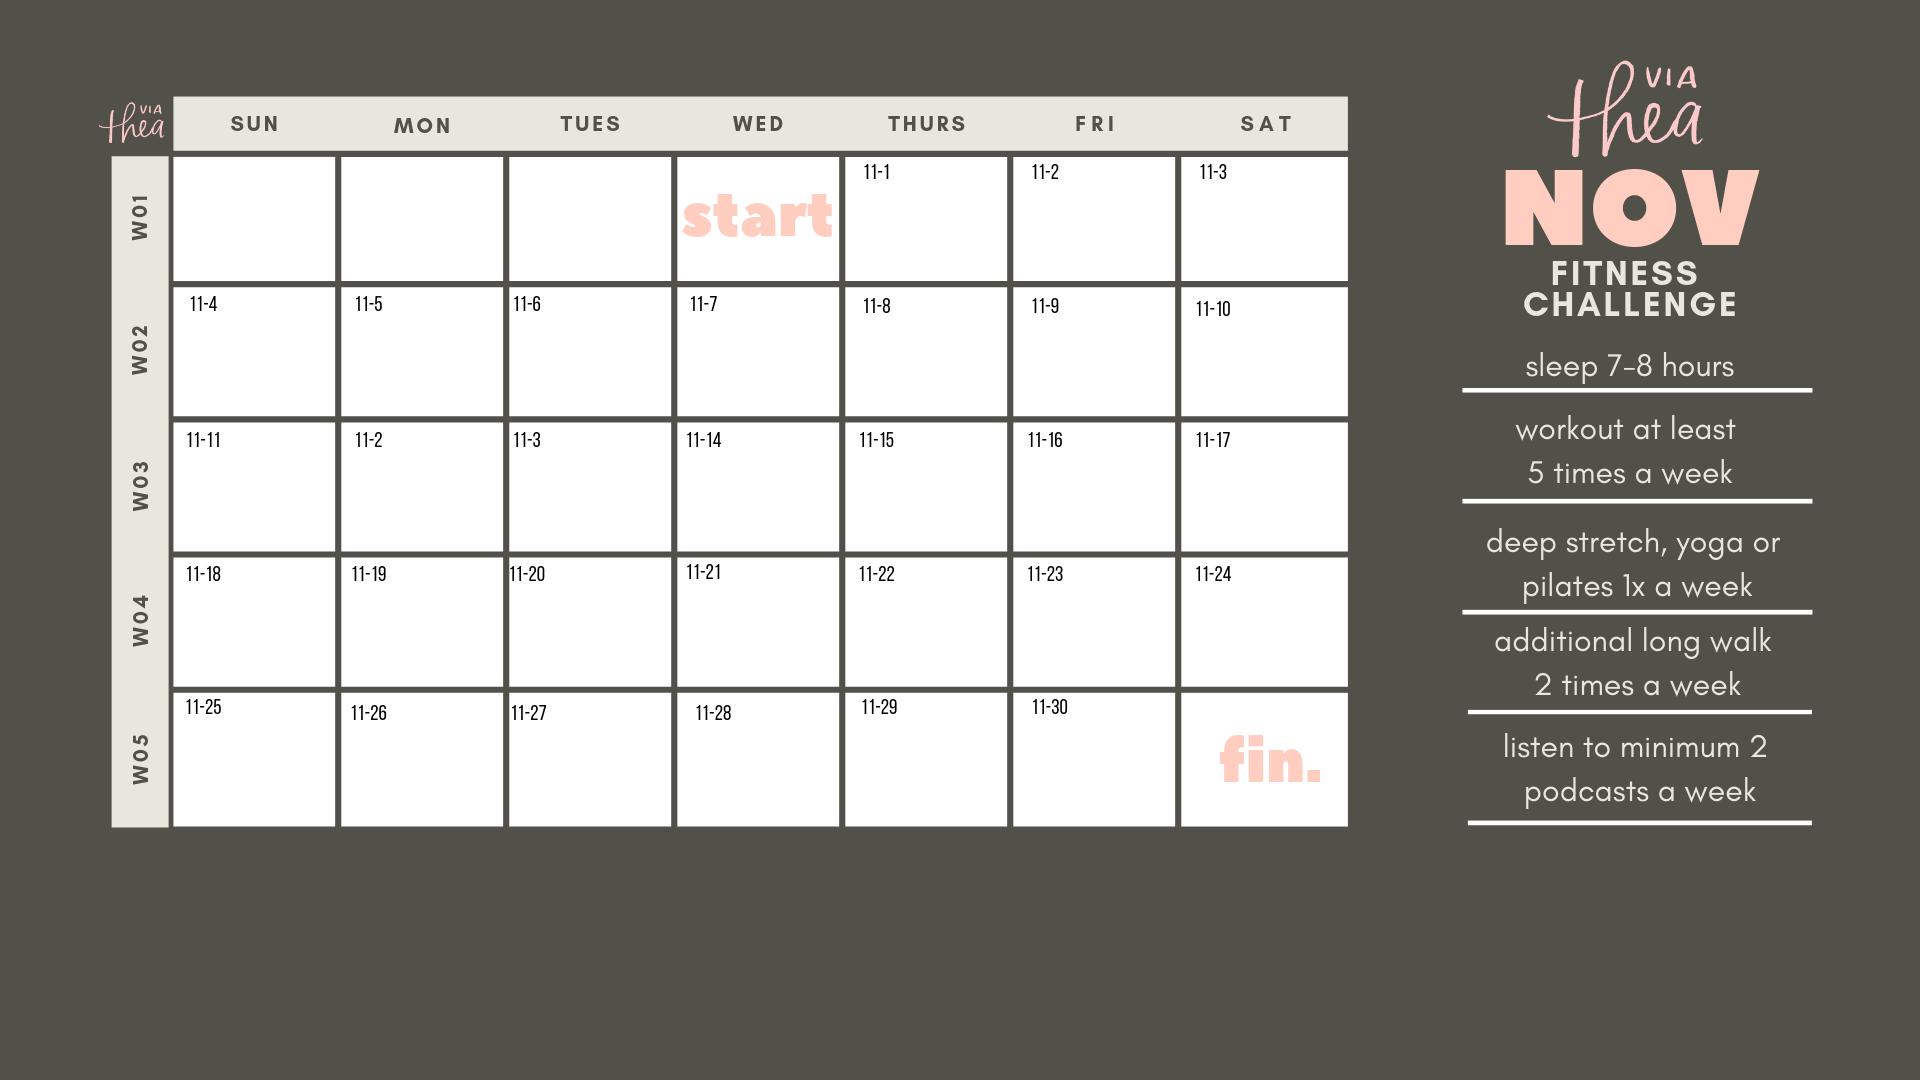 via Thea November 2018 Goal Setting calendar